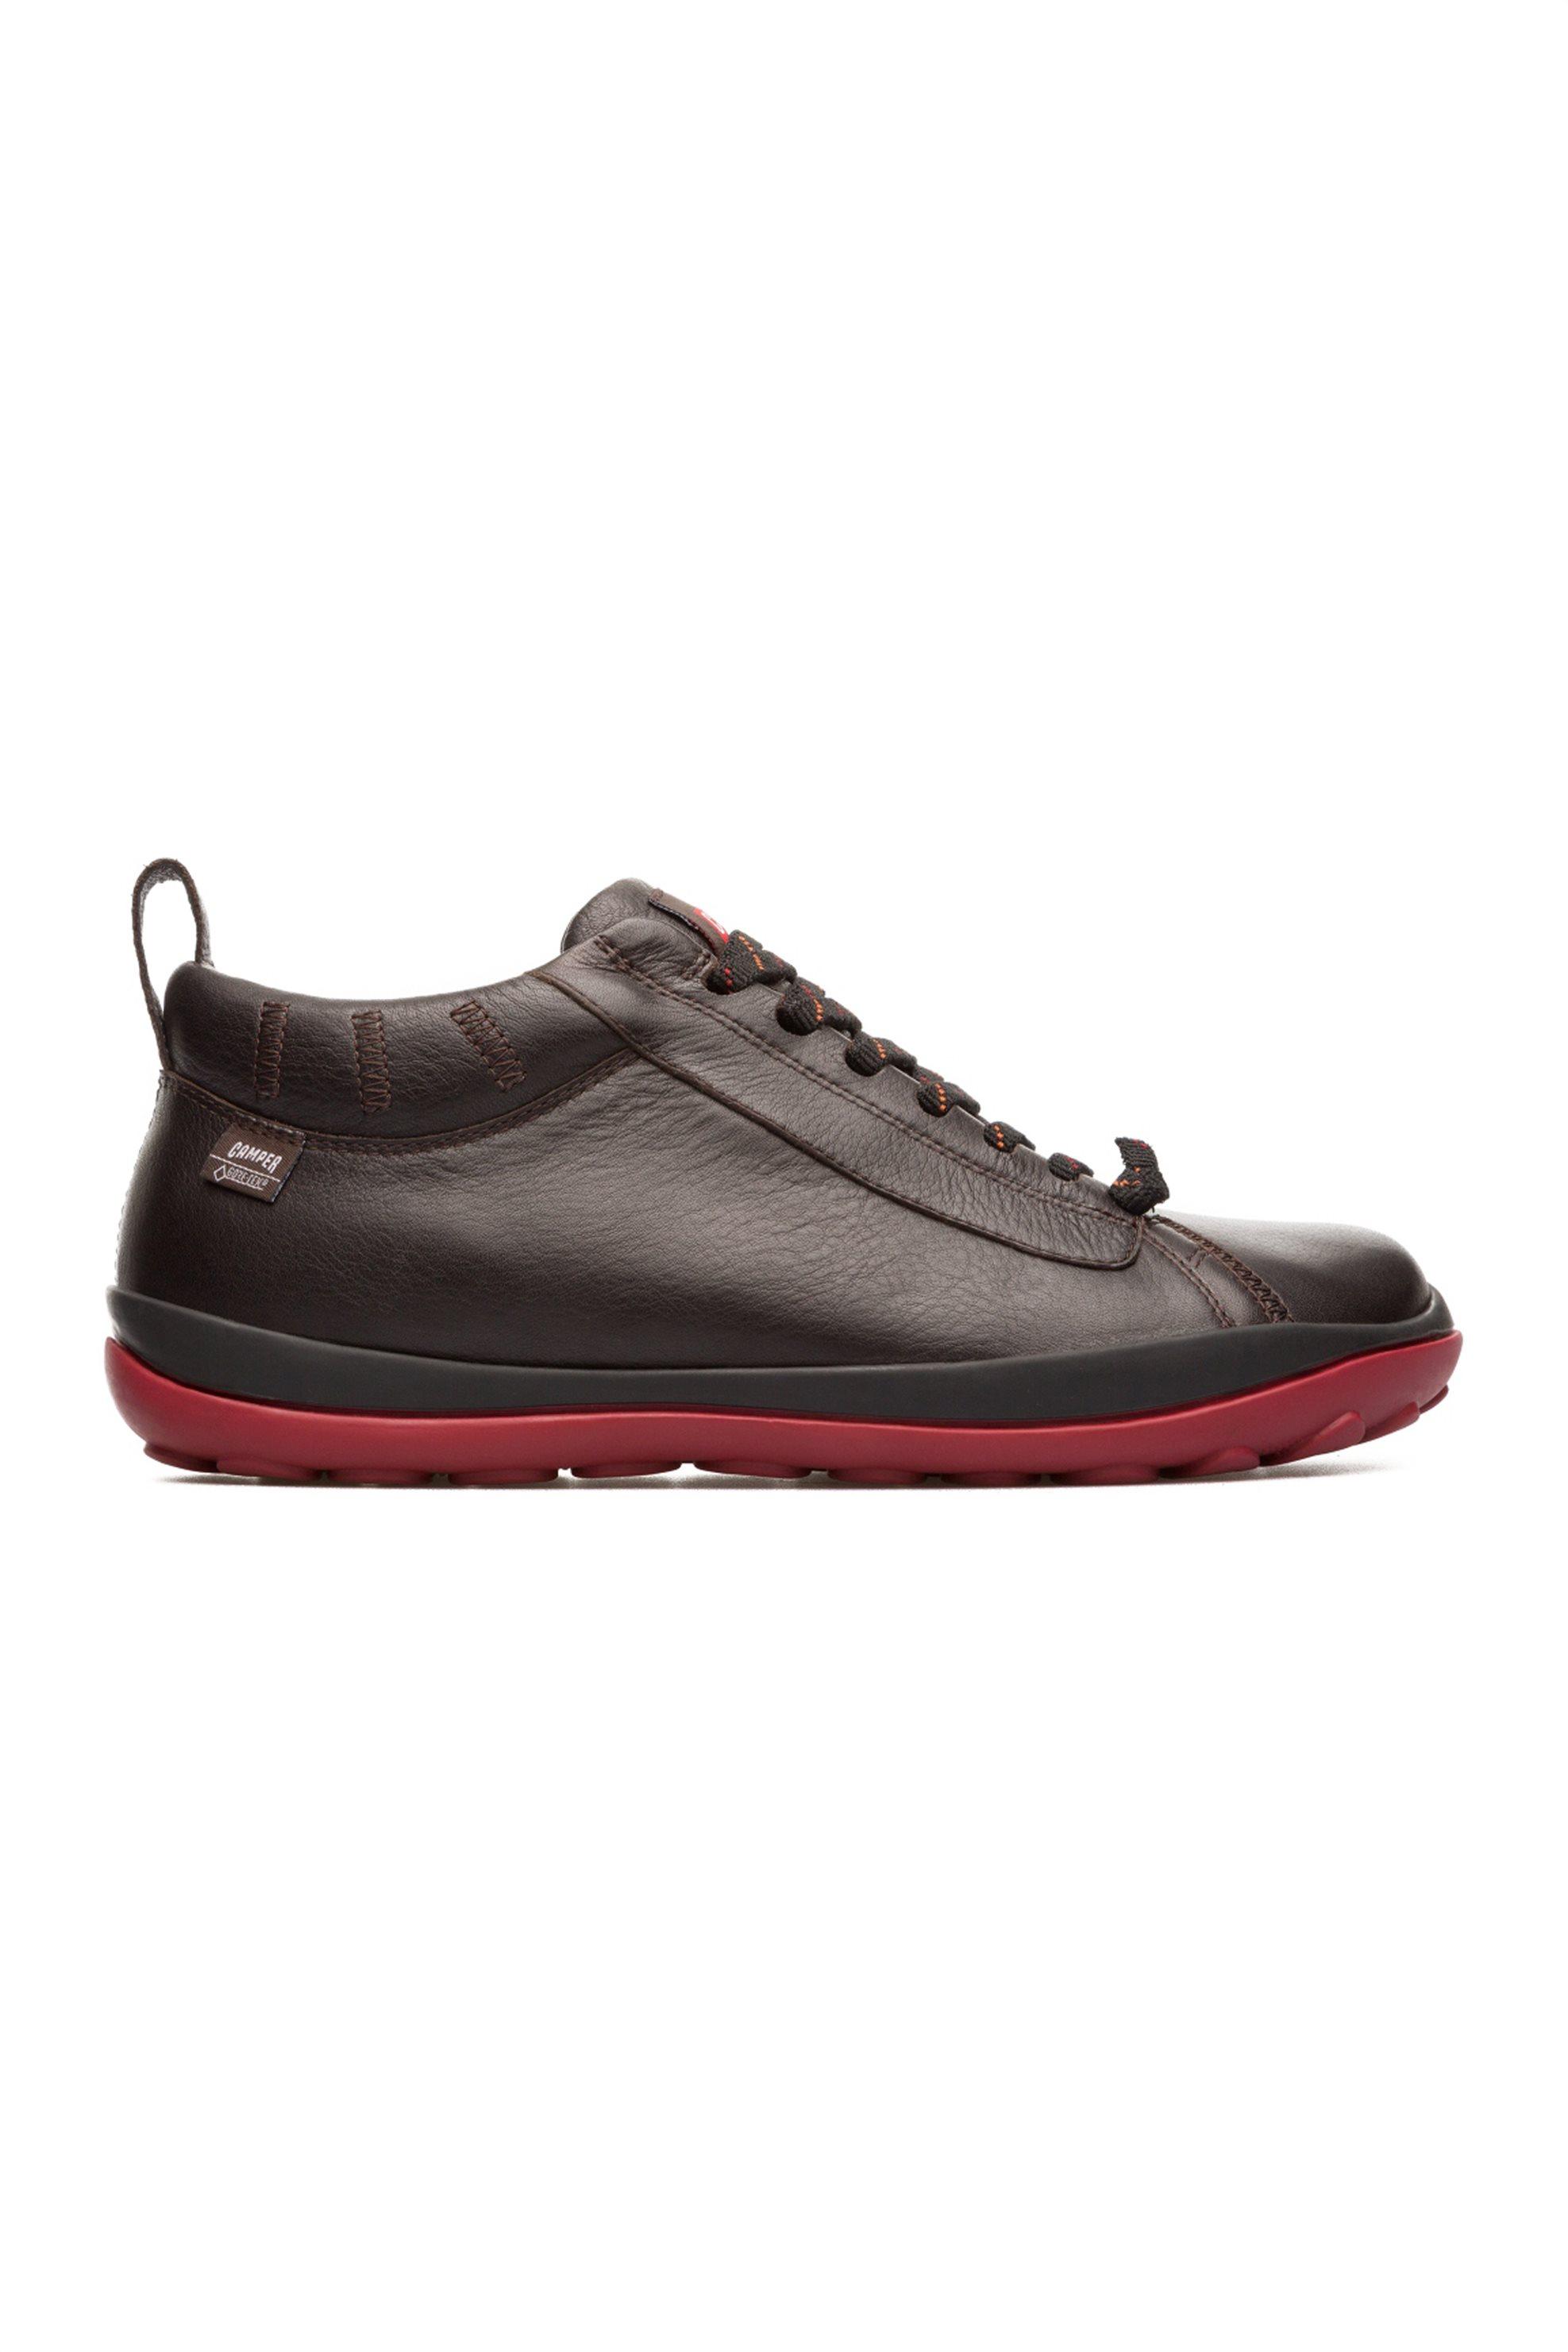 Camper ανδρικά παπούτσια δερμάτινα καφέ σκούρα Gore-Tex® Peu Pista - 36544-069 - ανδρασ   παπουτσια   trainers   sneakers